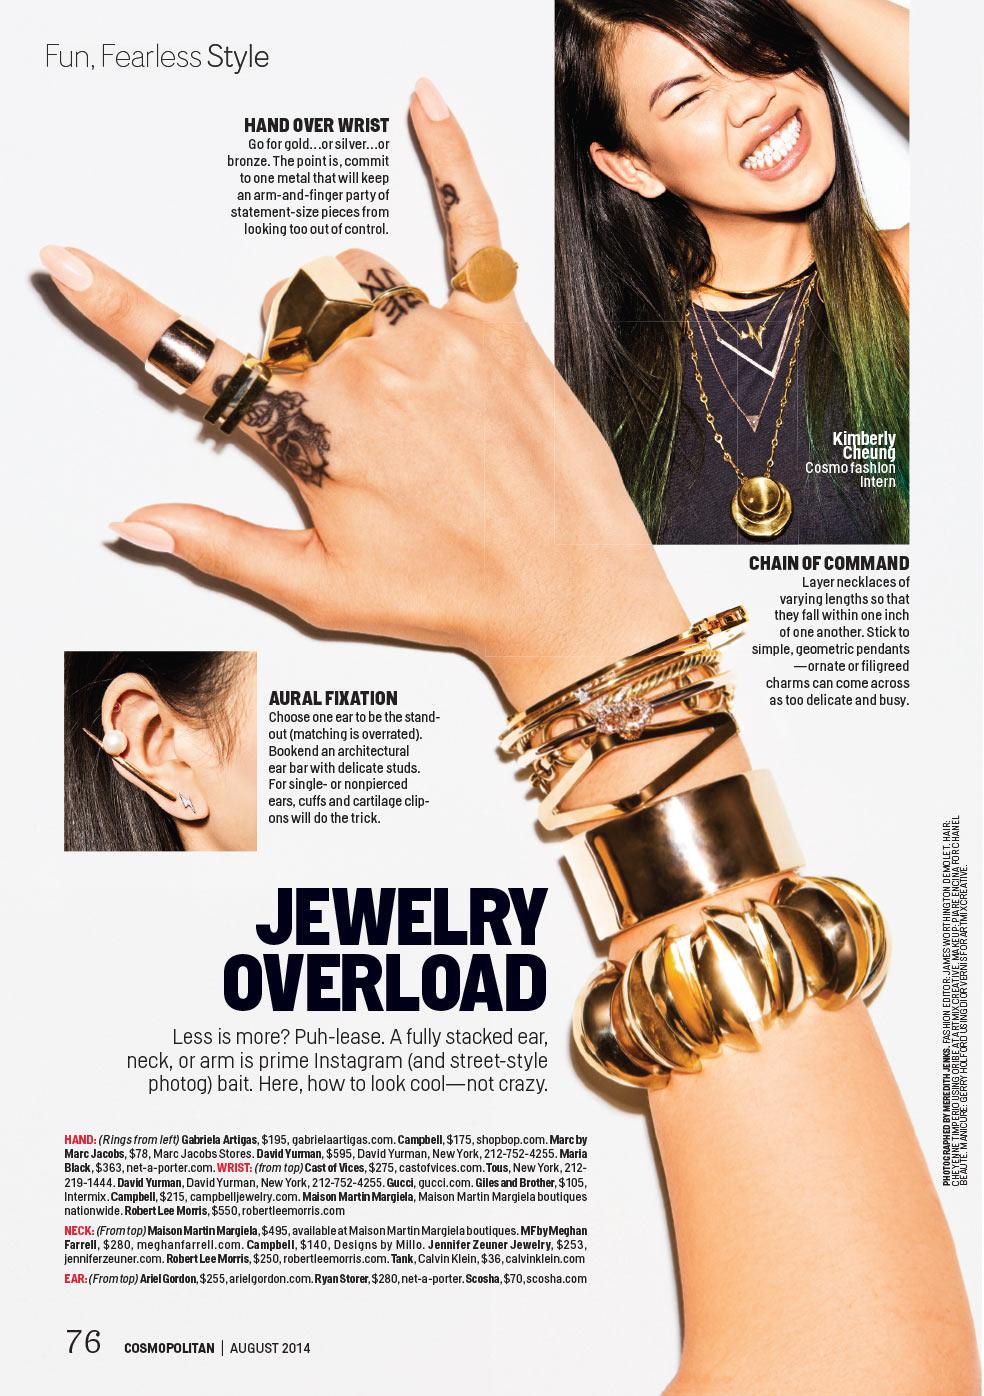 Cosmopolitan, October 2014